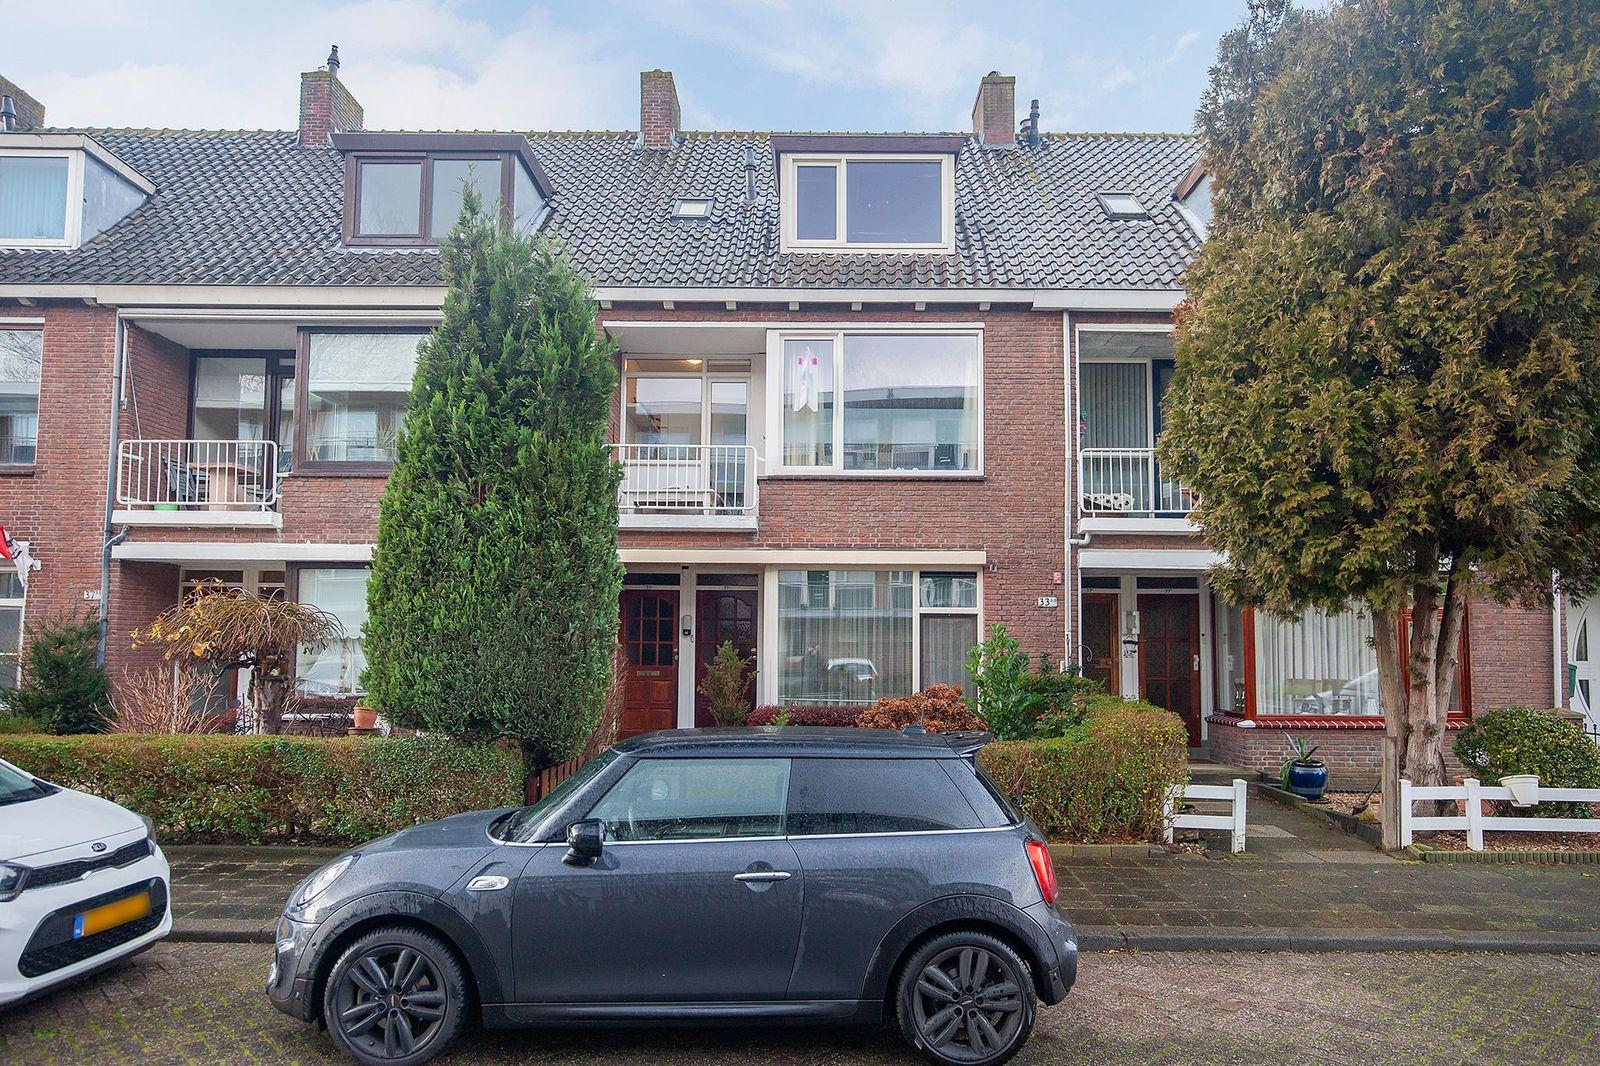 C.D.Tuinenburgstraat 35-B, Rotterdam